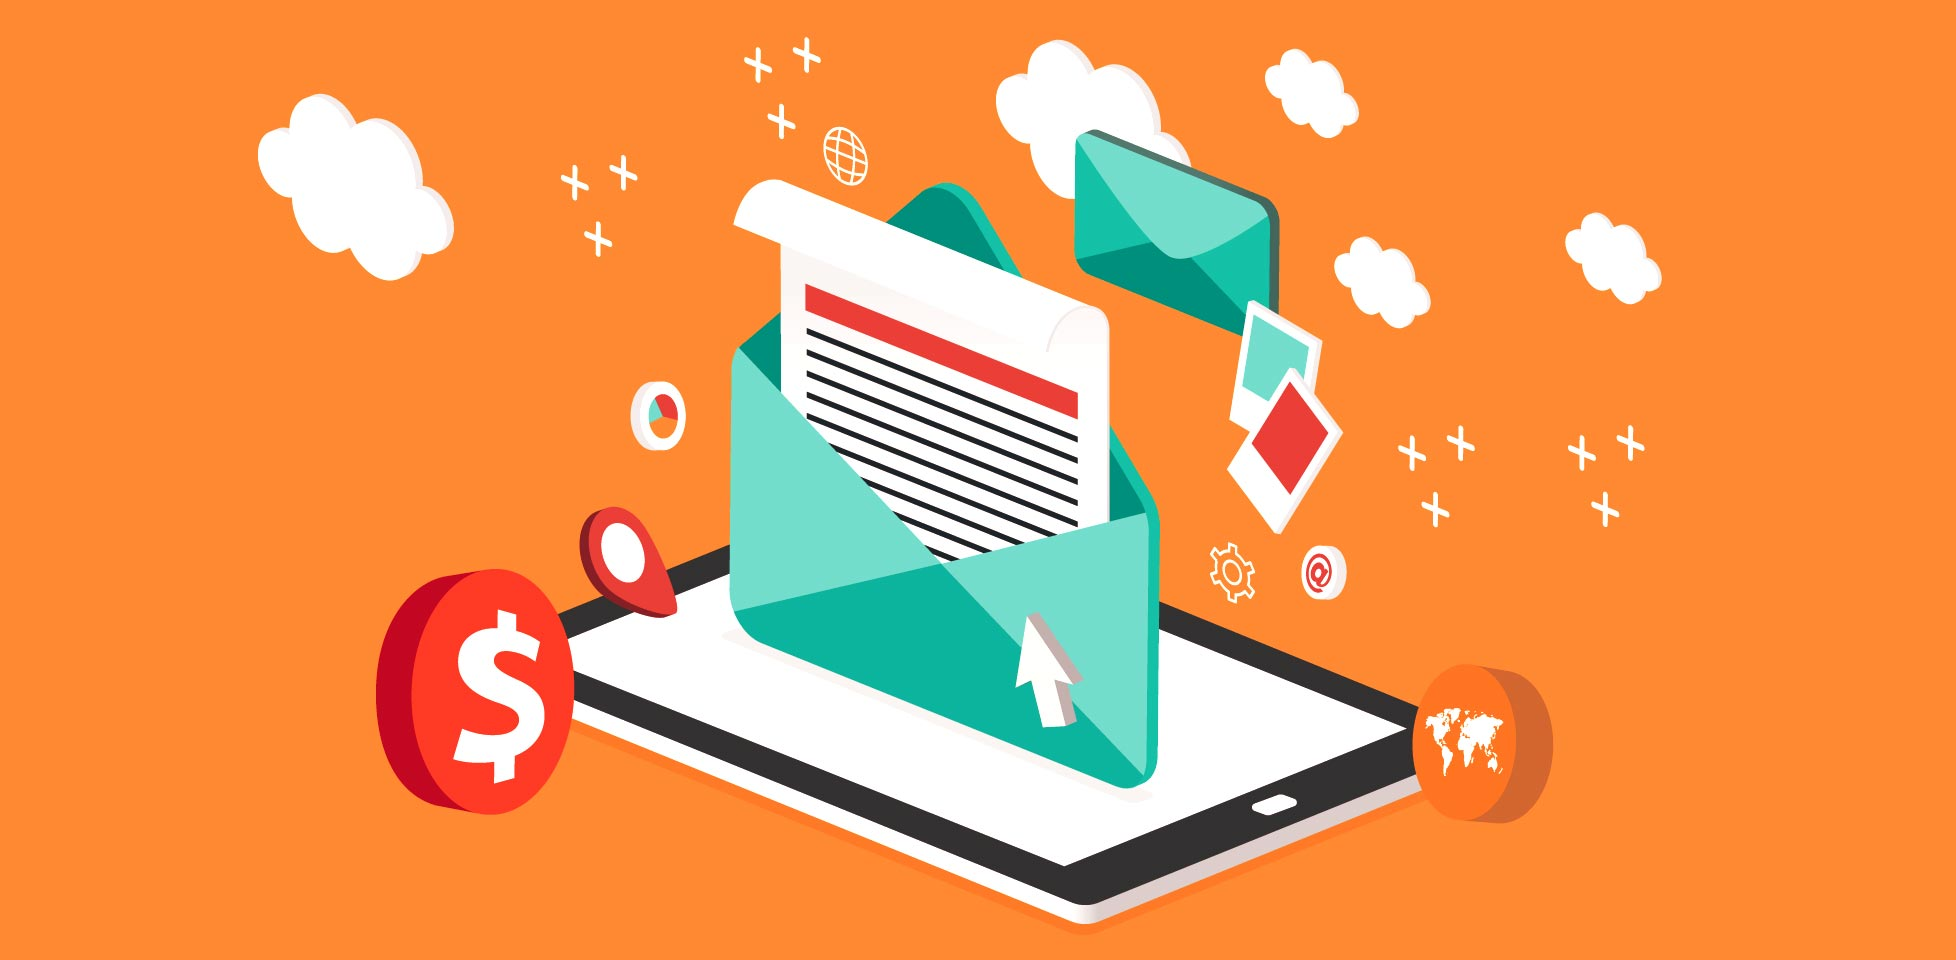 Photo of فروش بیشتر با ایمیل مارکتینگ جلسه اول : تا چه حد بازاریابی ایمیلی اهمیت دارد؟